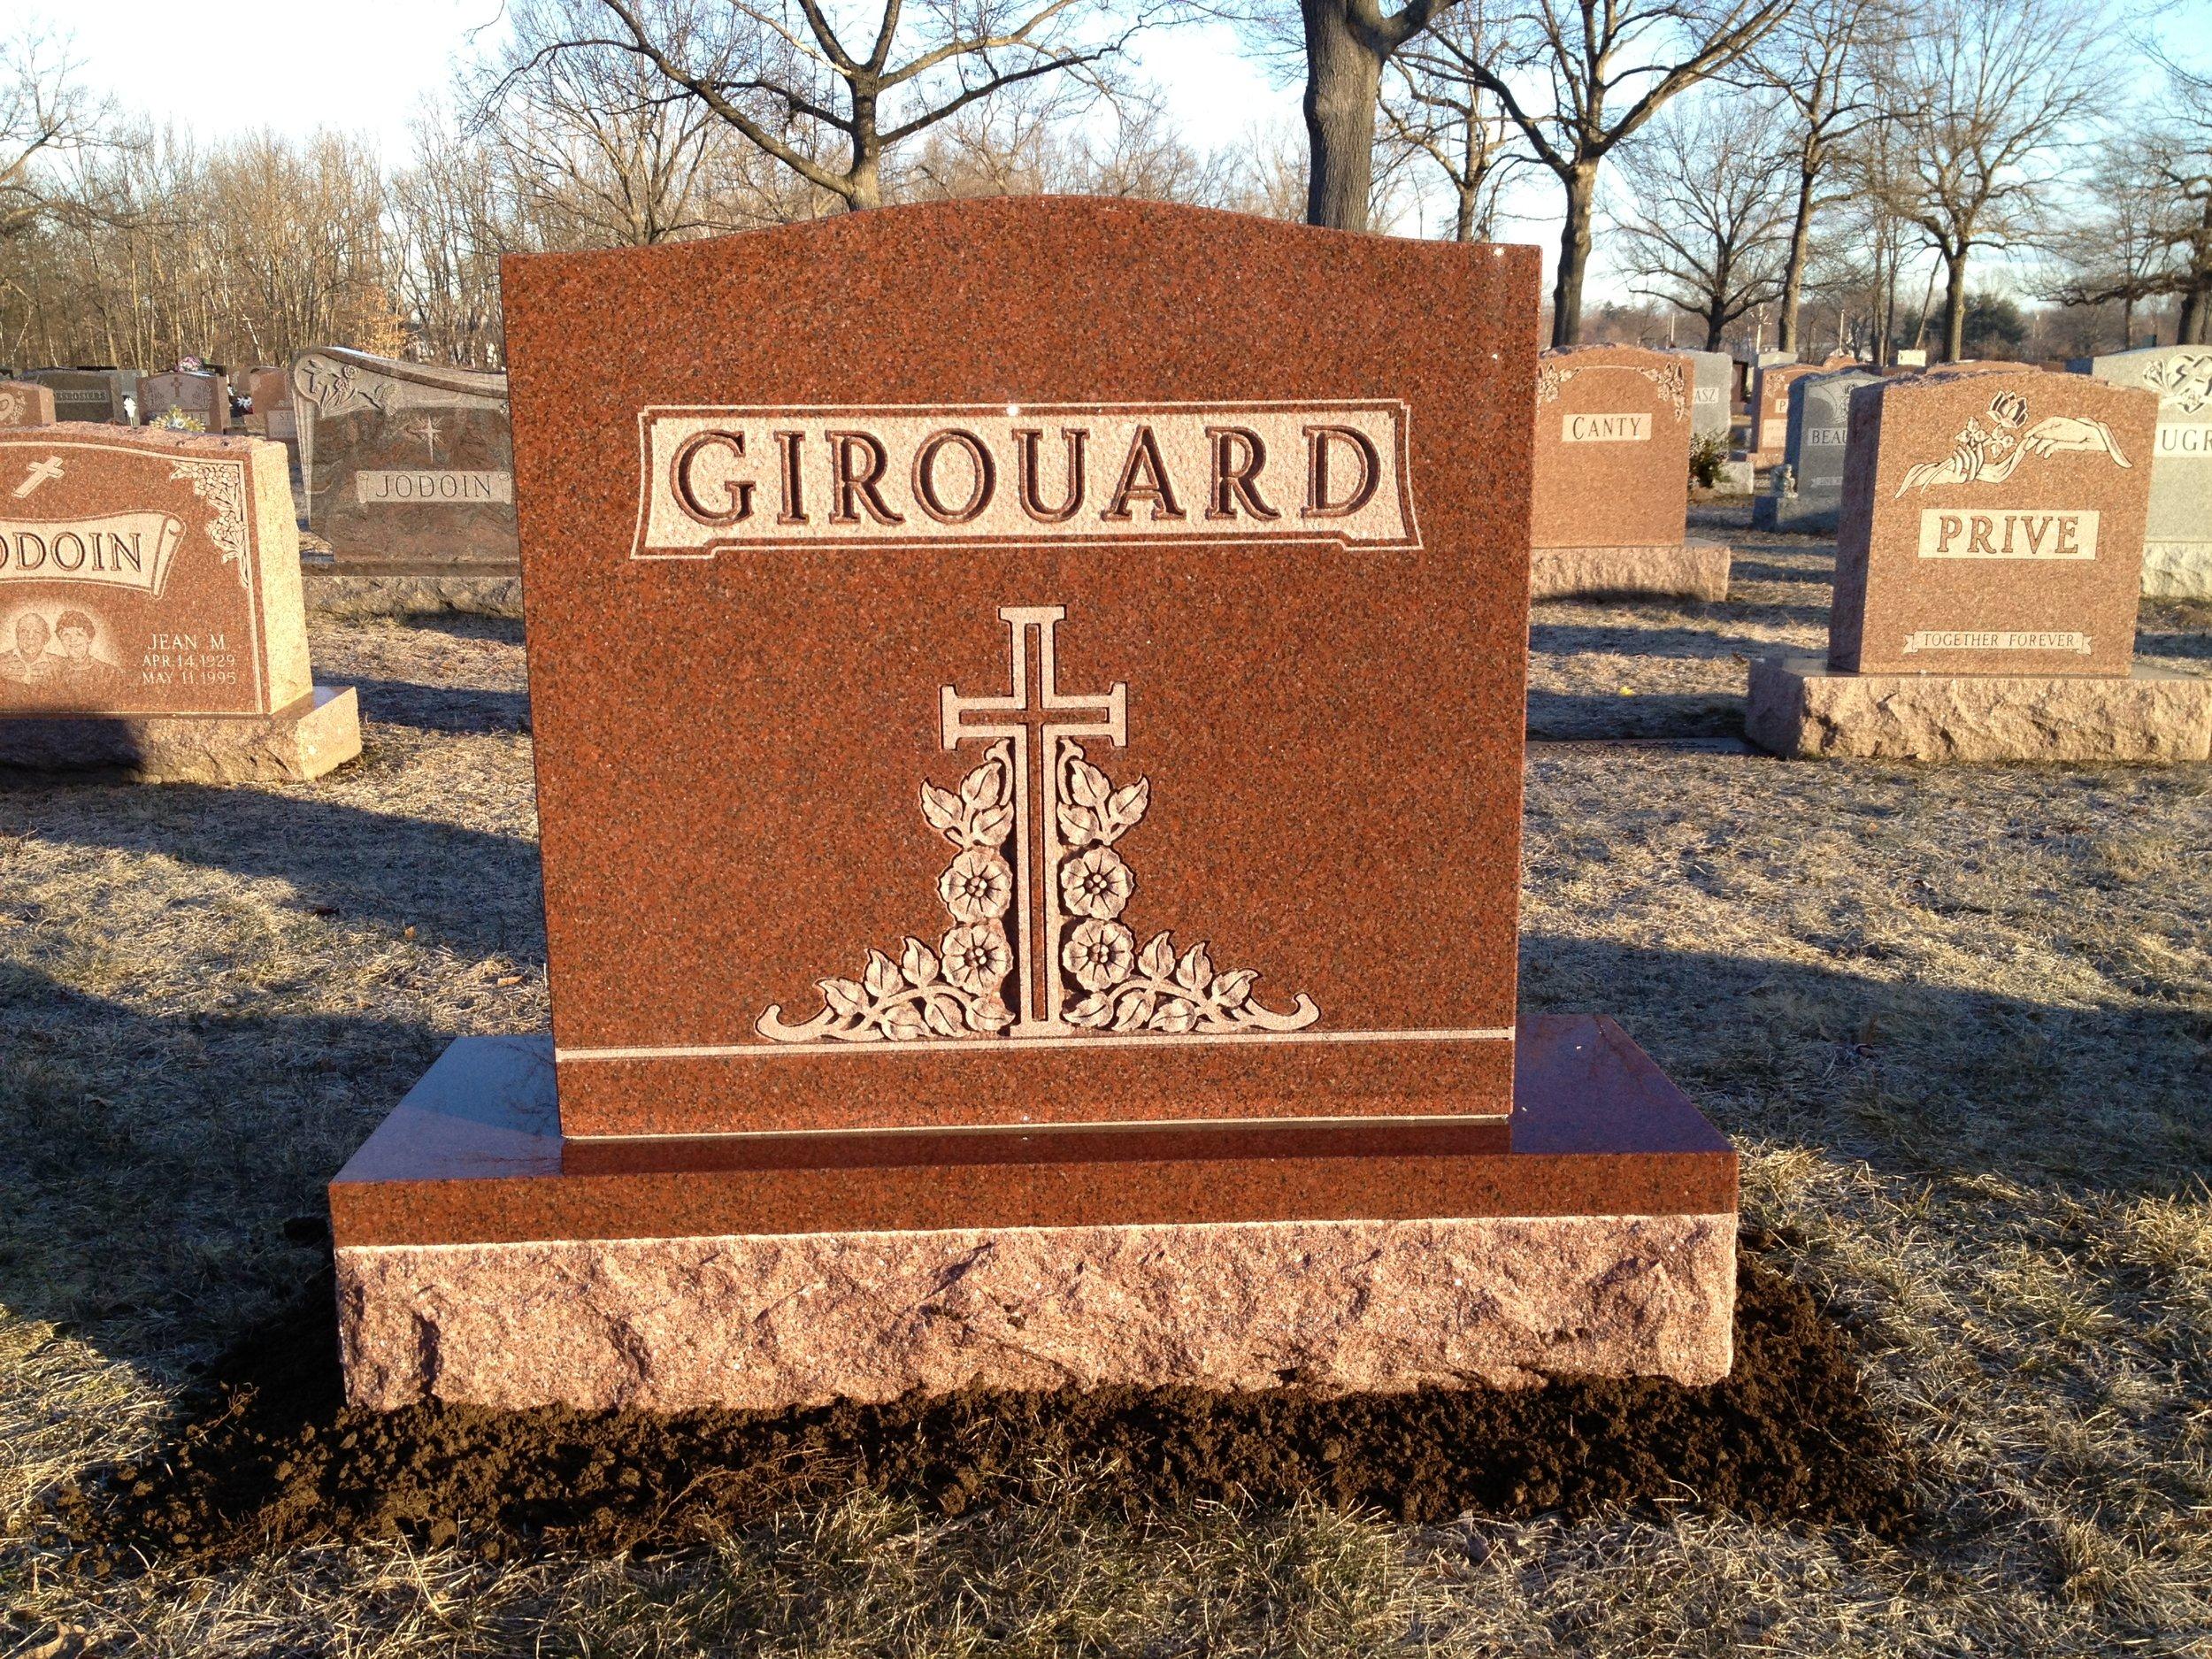 Girouard 1.JPG